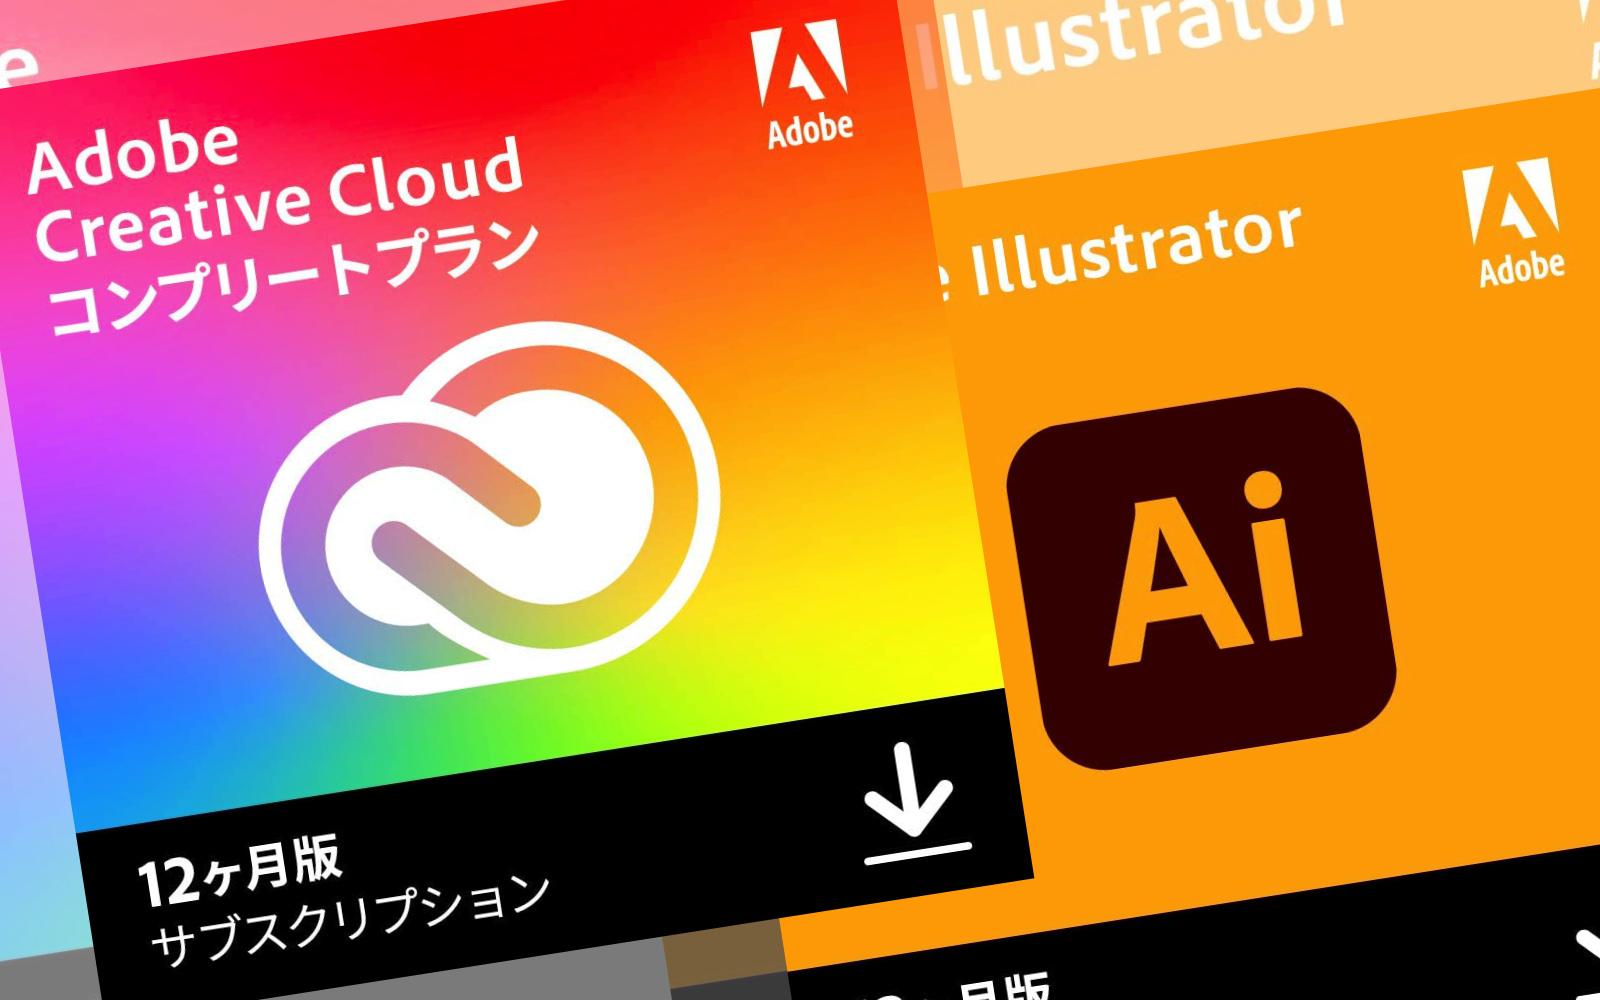 Adobe CC and Illustrator sale